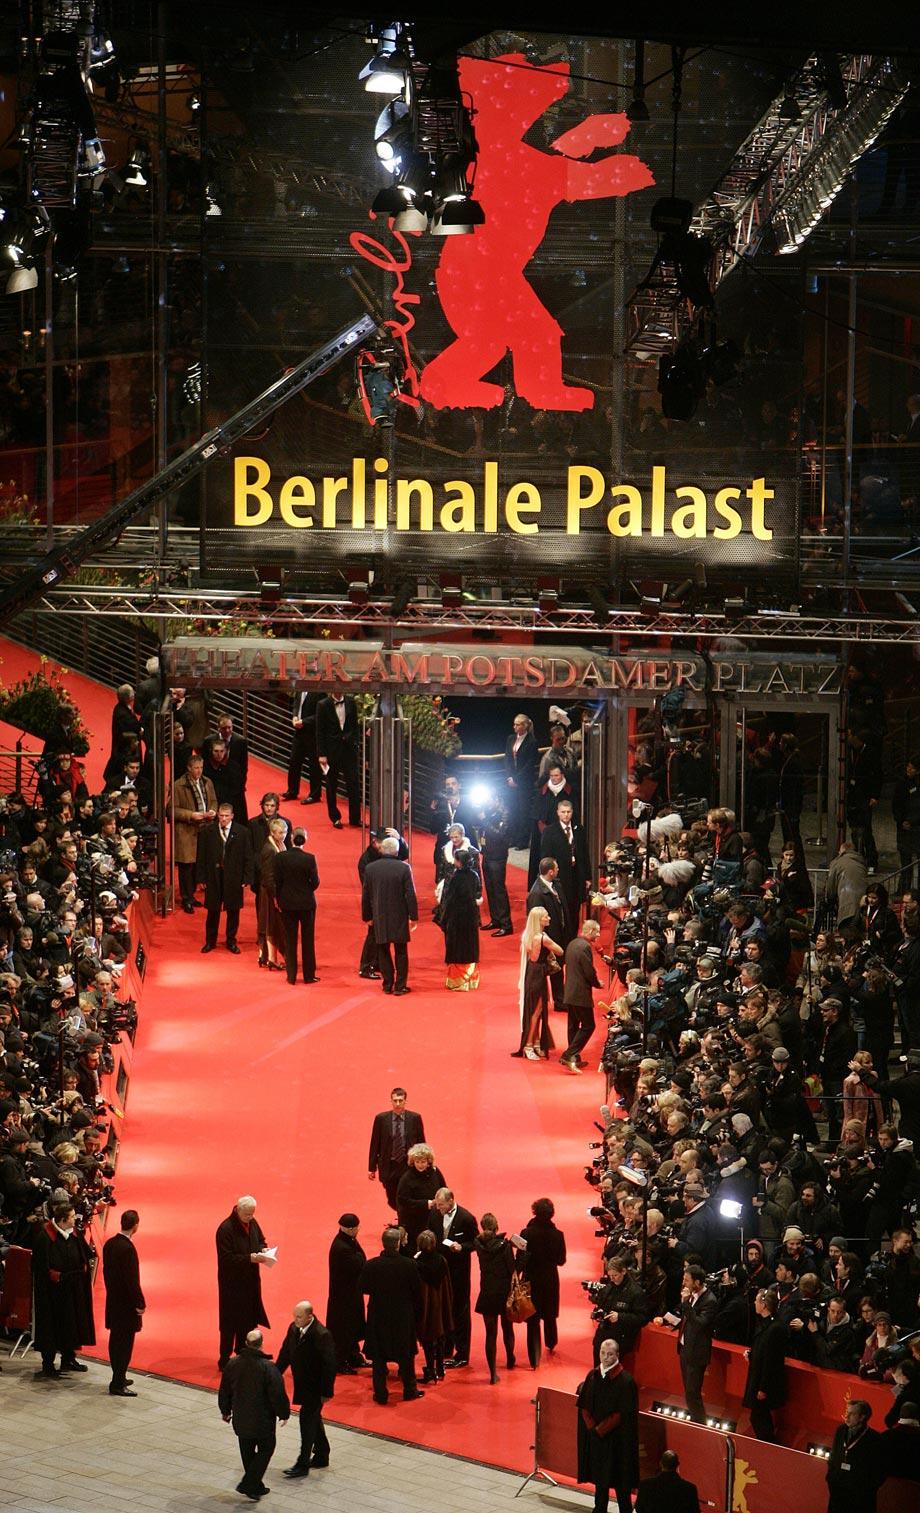 berlinale palast